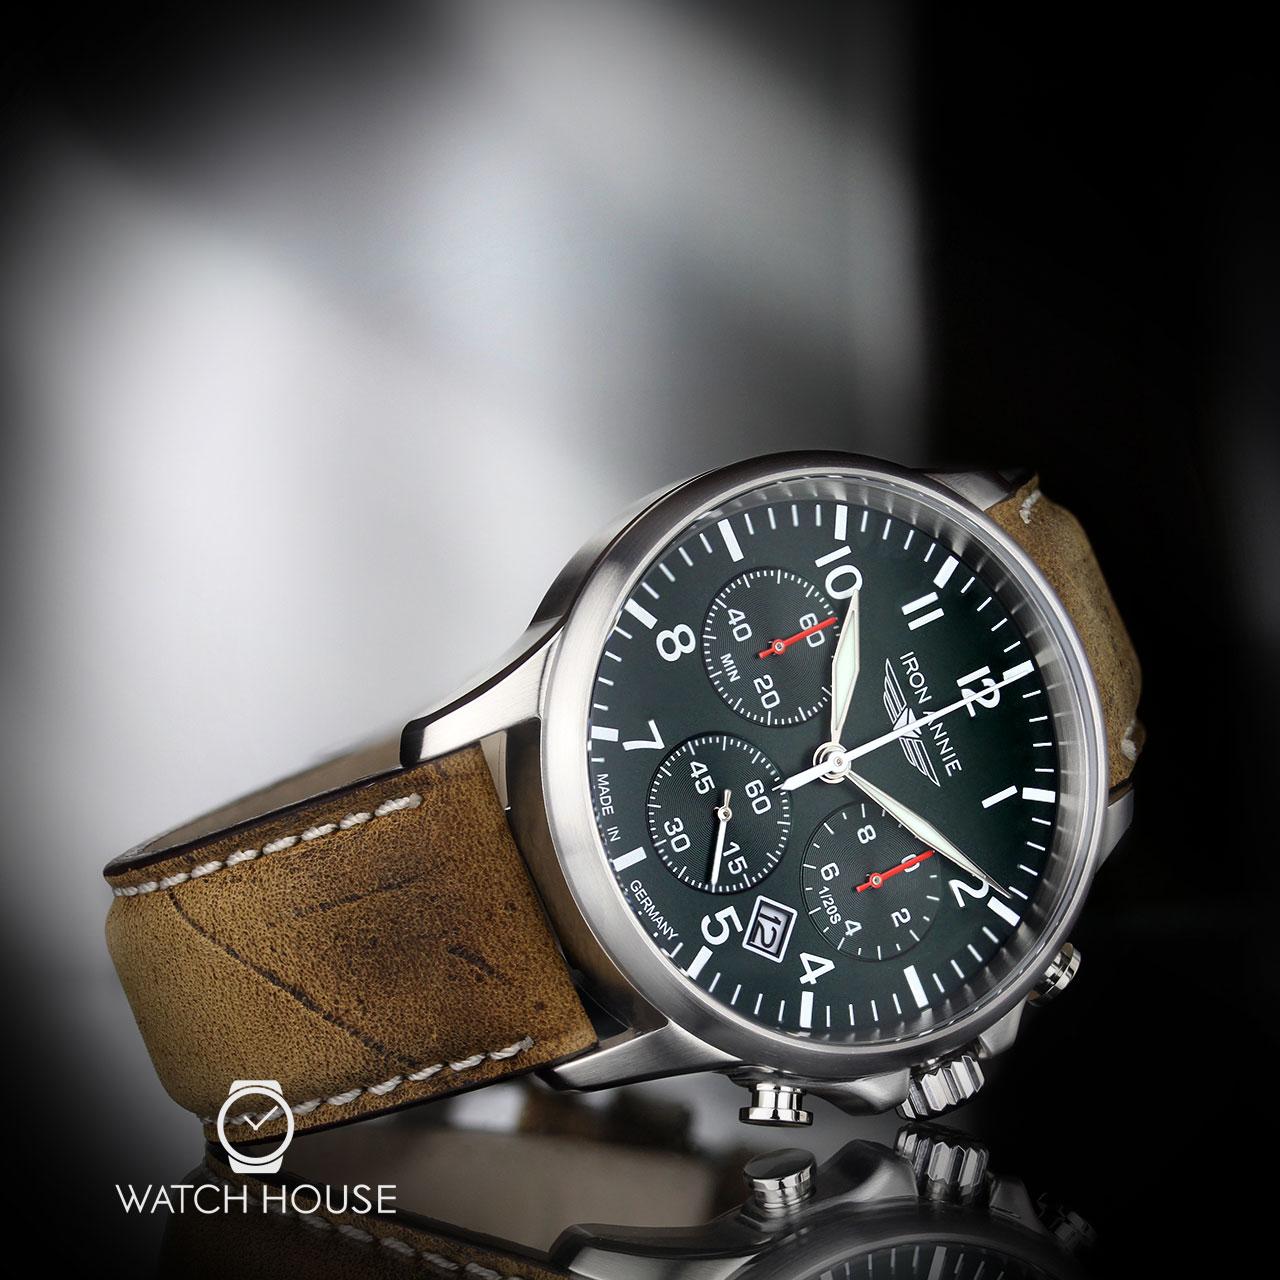 Zu Line Iron Details Herren Armbanduhr Annie Chronograph Captain's Serie 5872 4 rdsthQ